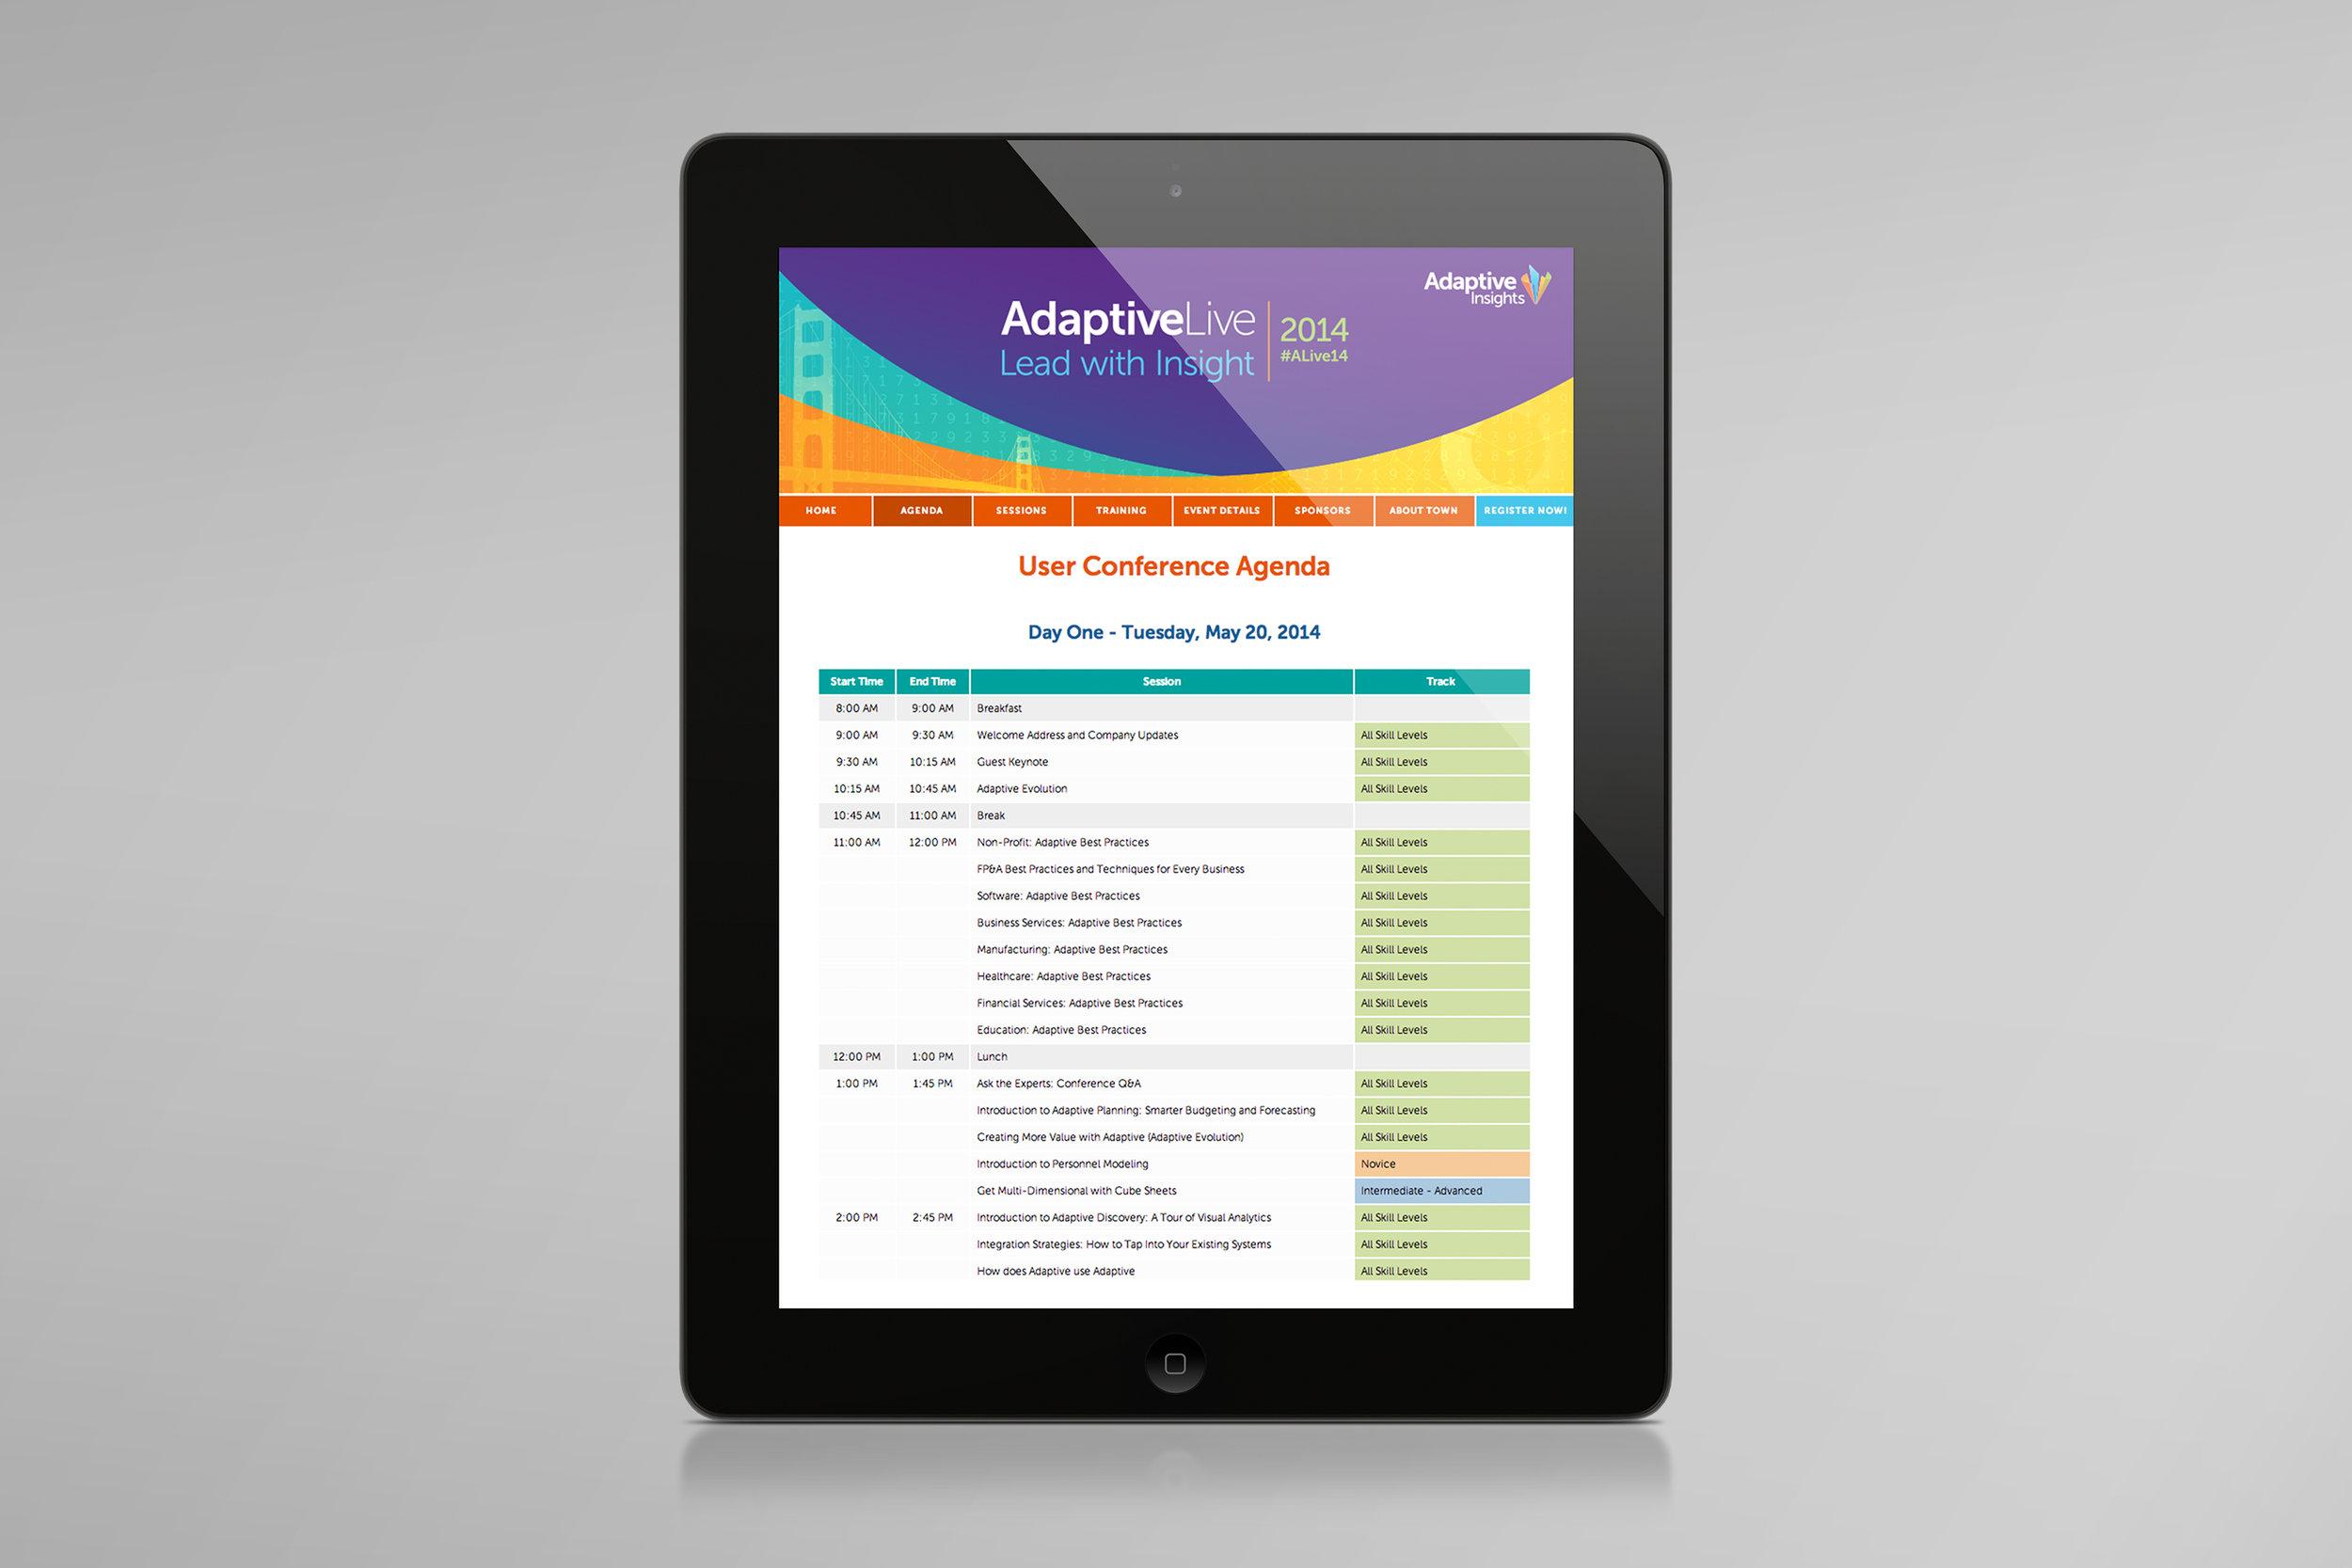 AdaptiveLive2014_Reg_webpage-ipad_1_v3.jpg